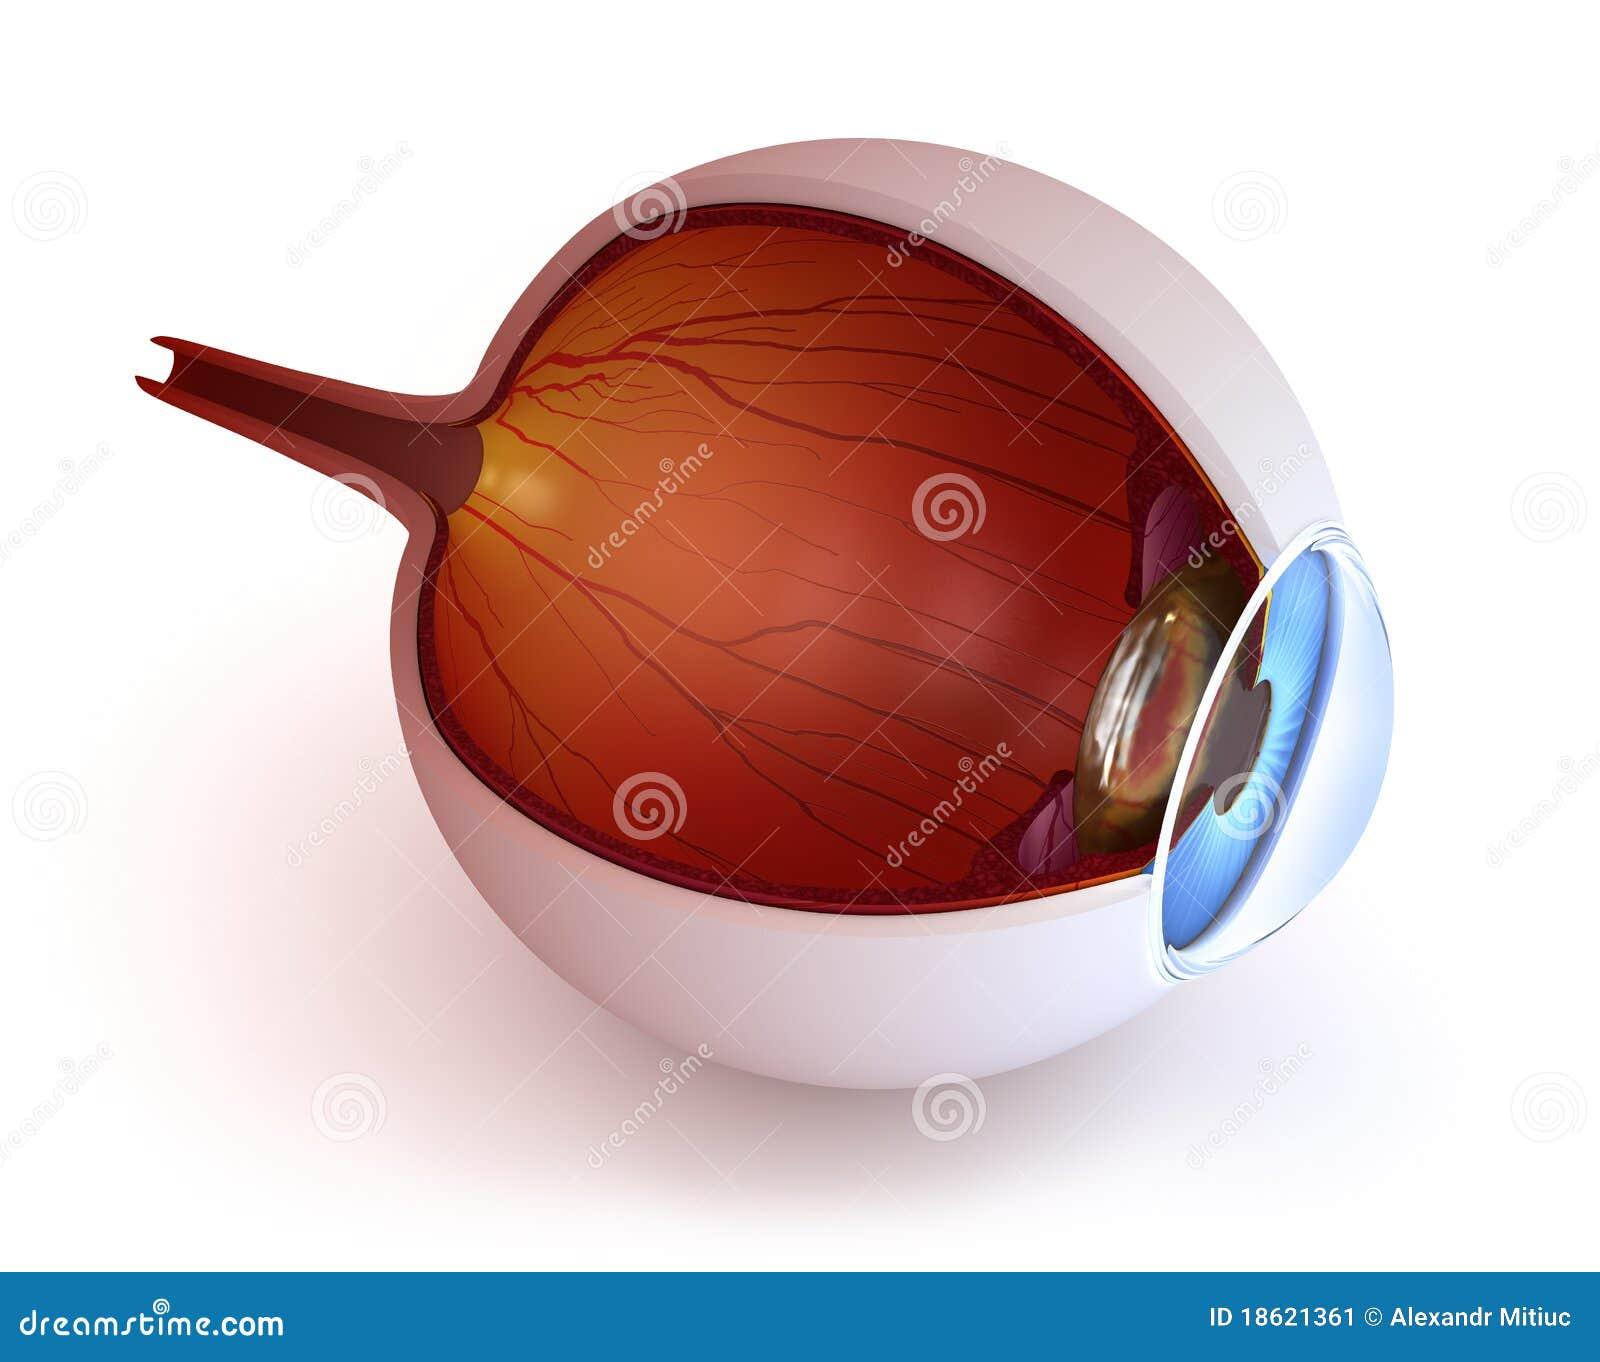 Anatomy of eye - inner structure